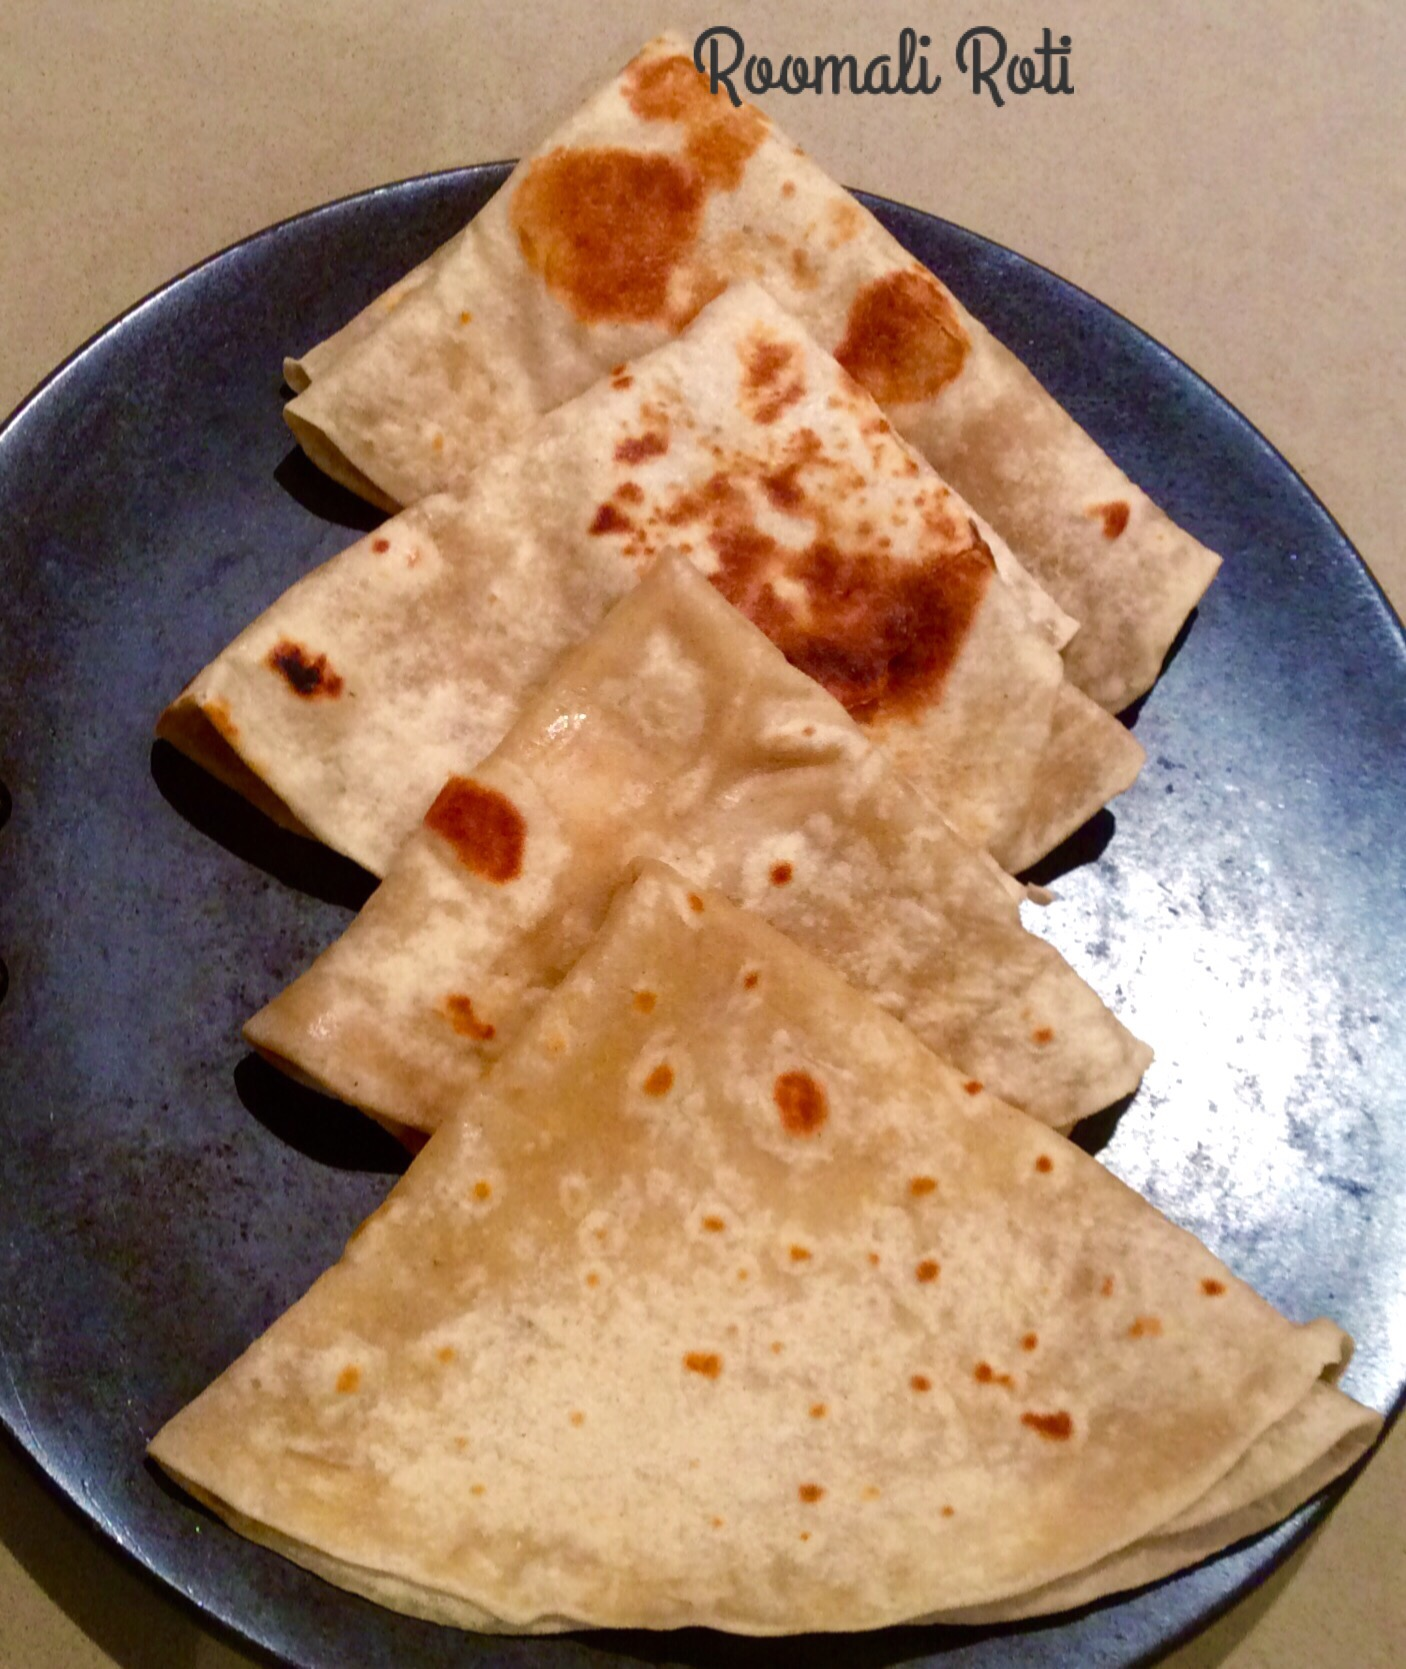 Vegan Roomali Roti - 5 Ingredients